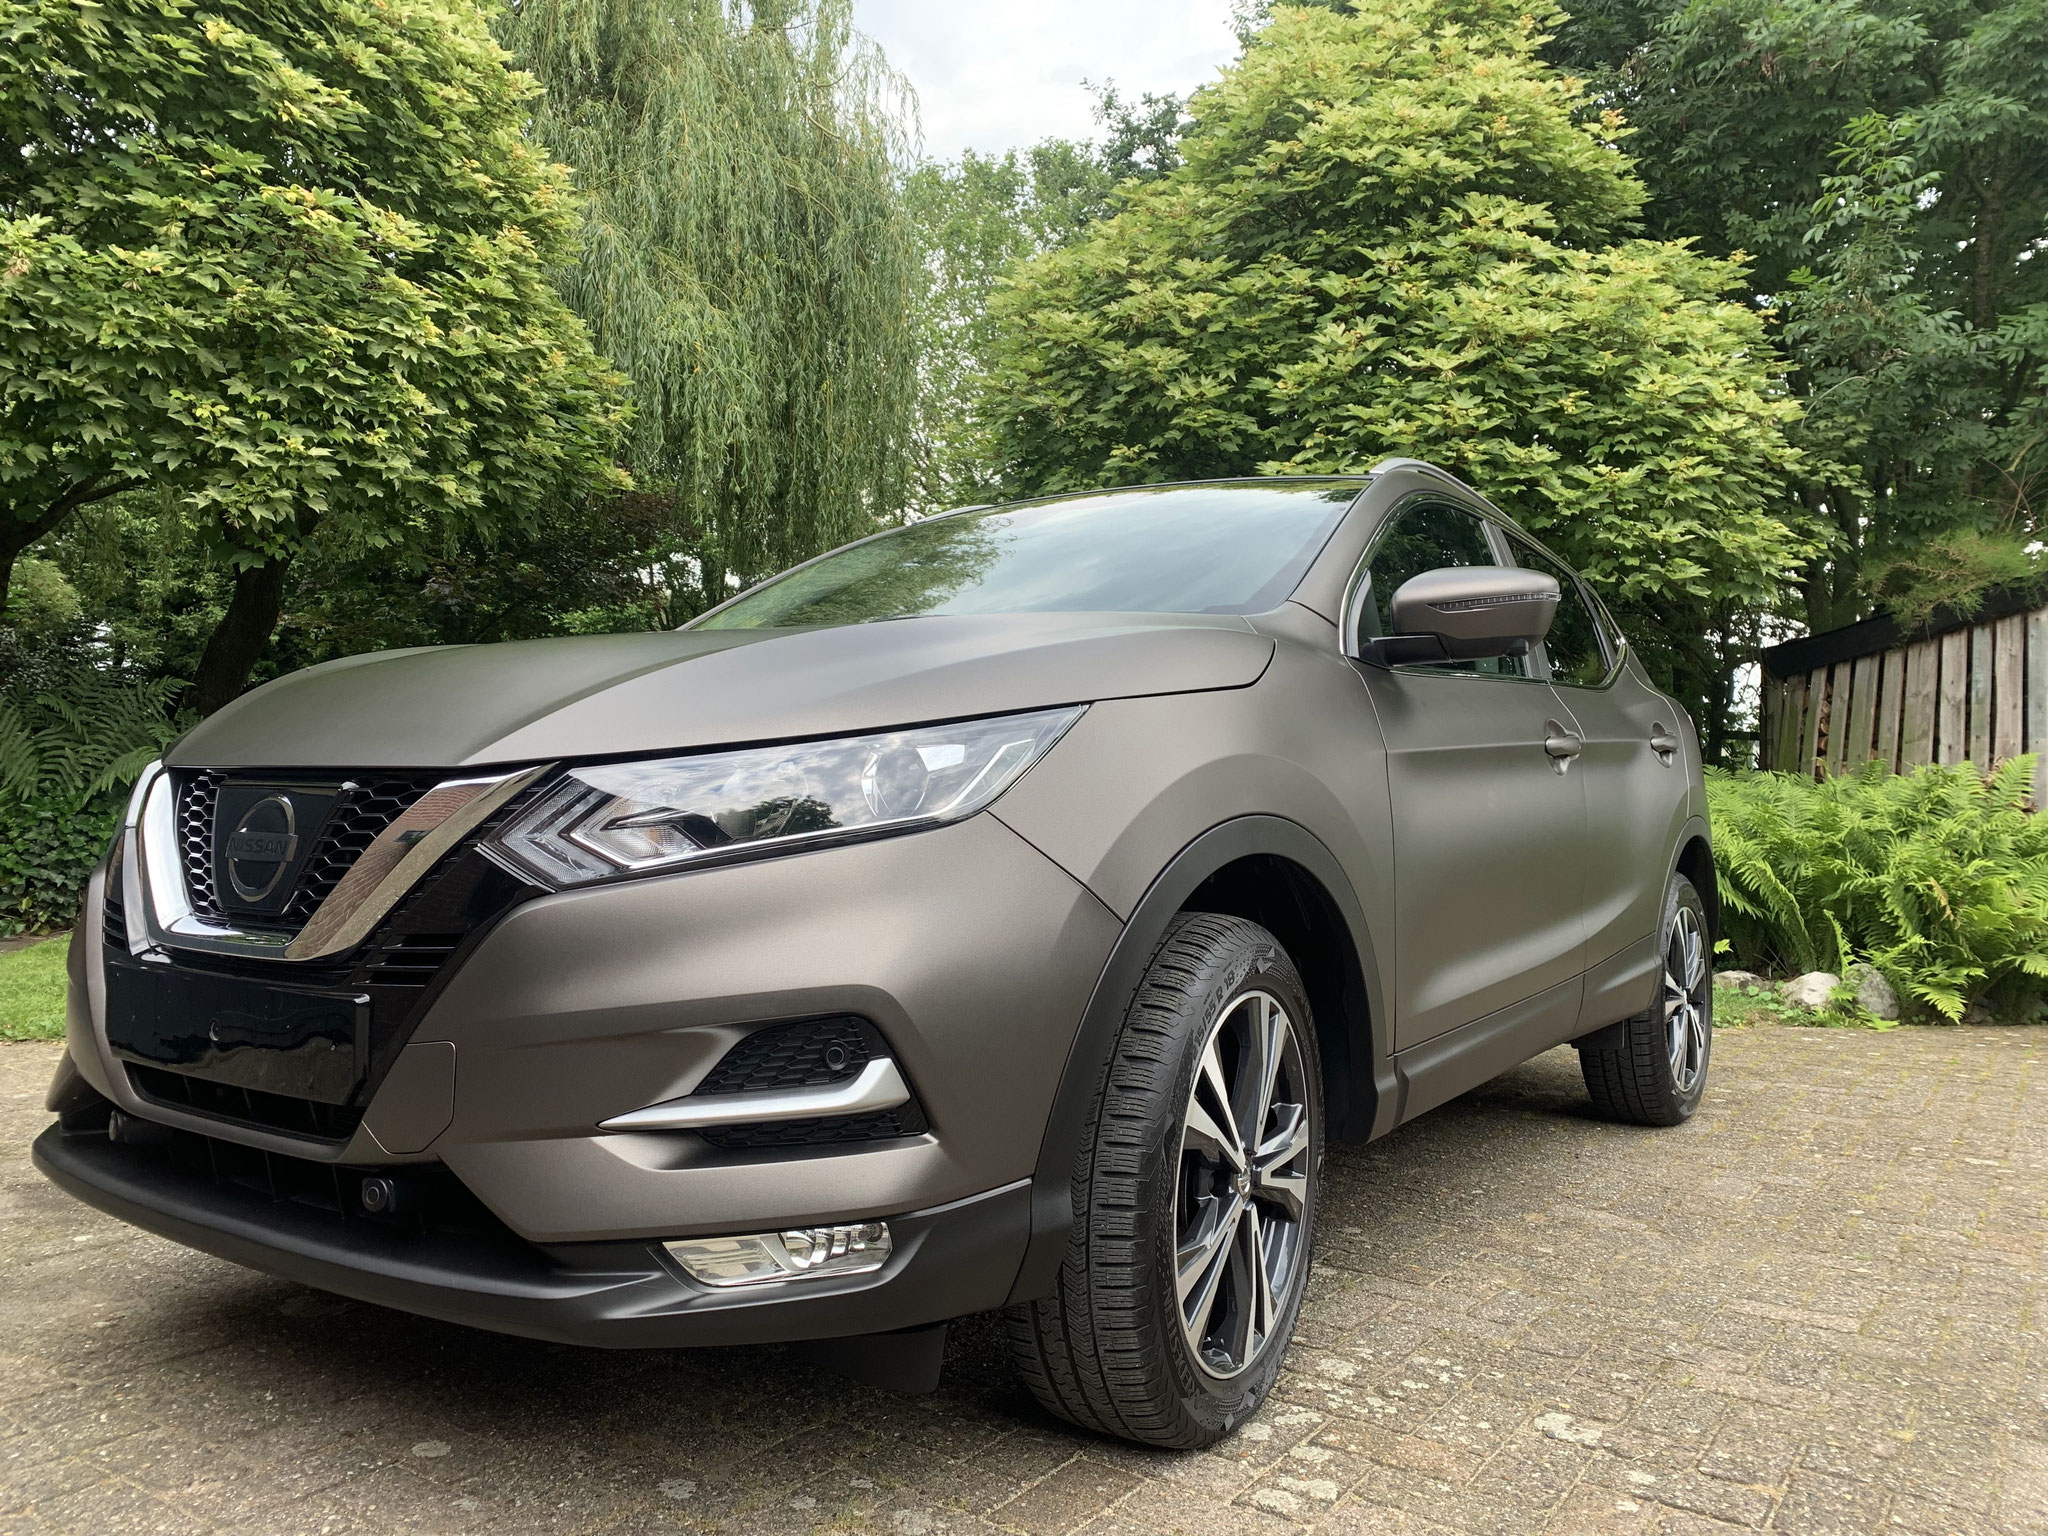 Nissan Qashqai Full Matte Coating Package